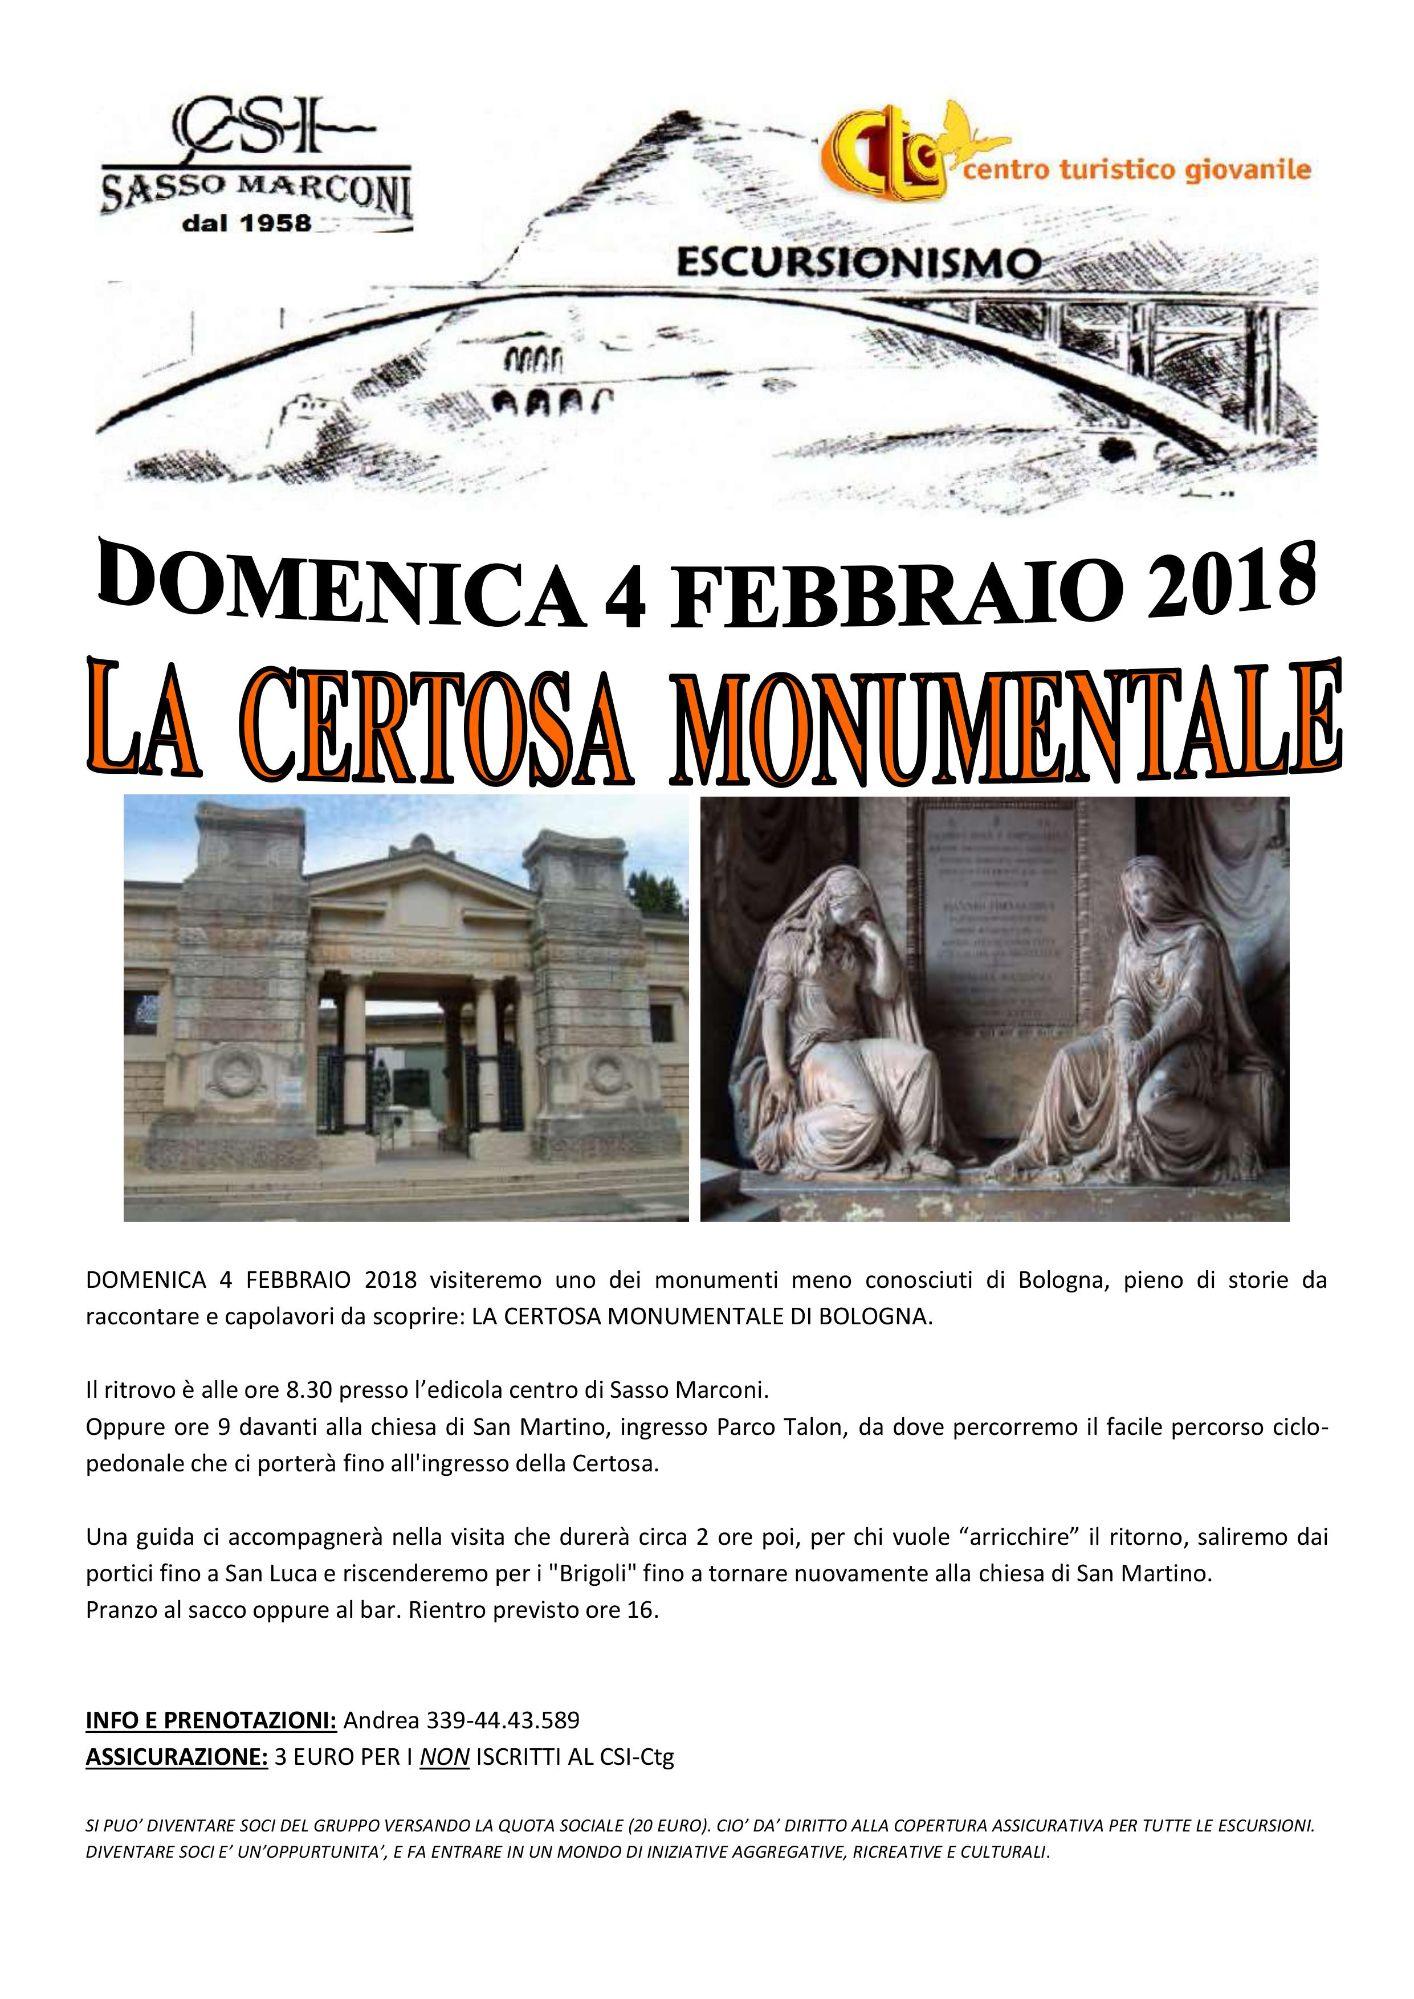 La Certosa Monumentale